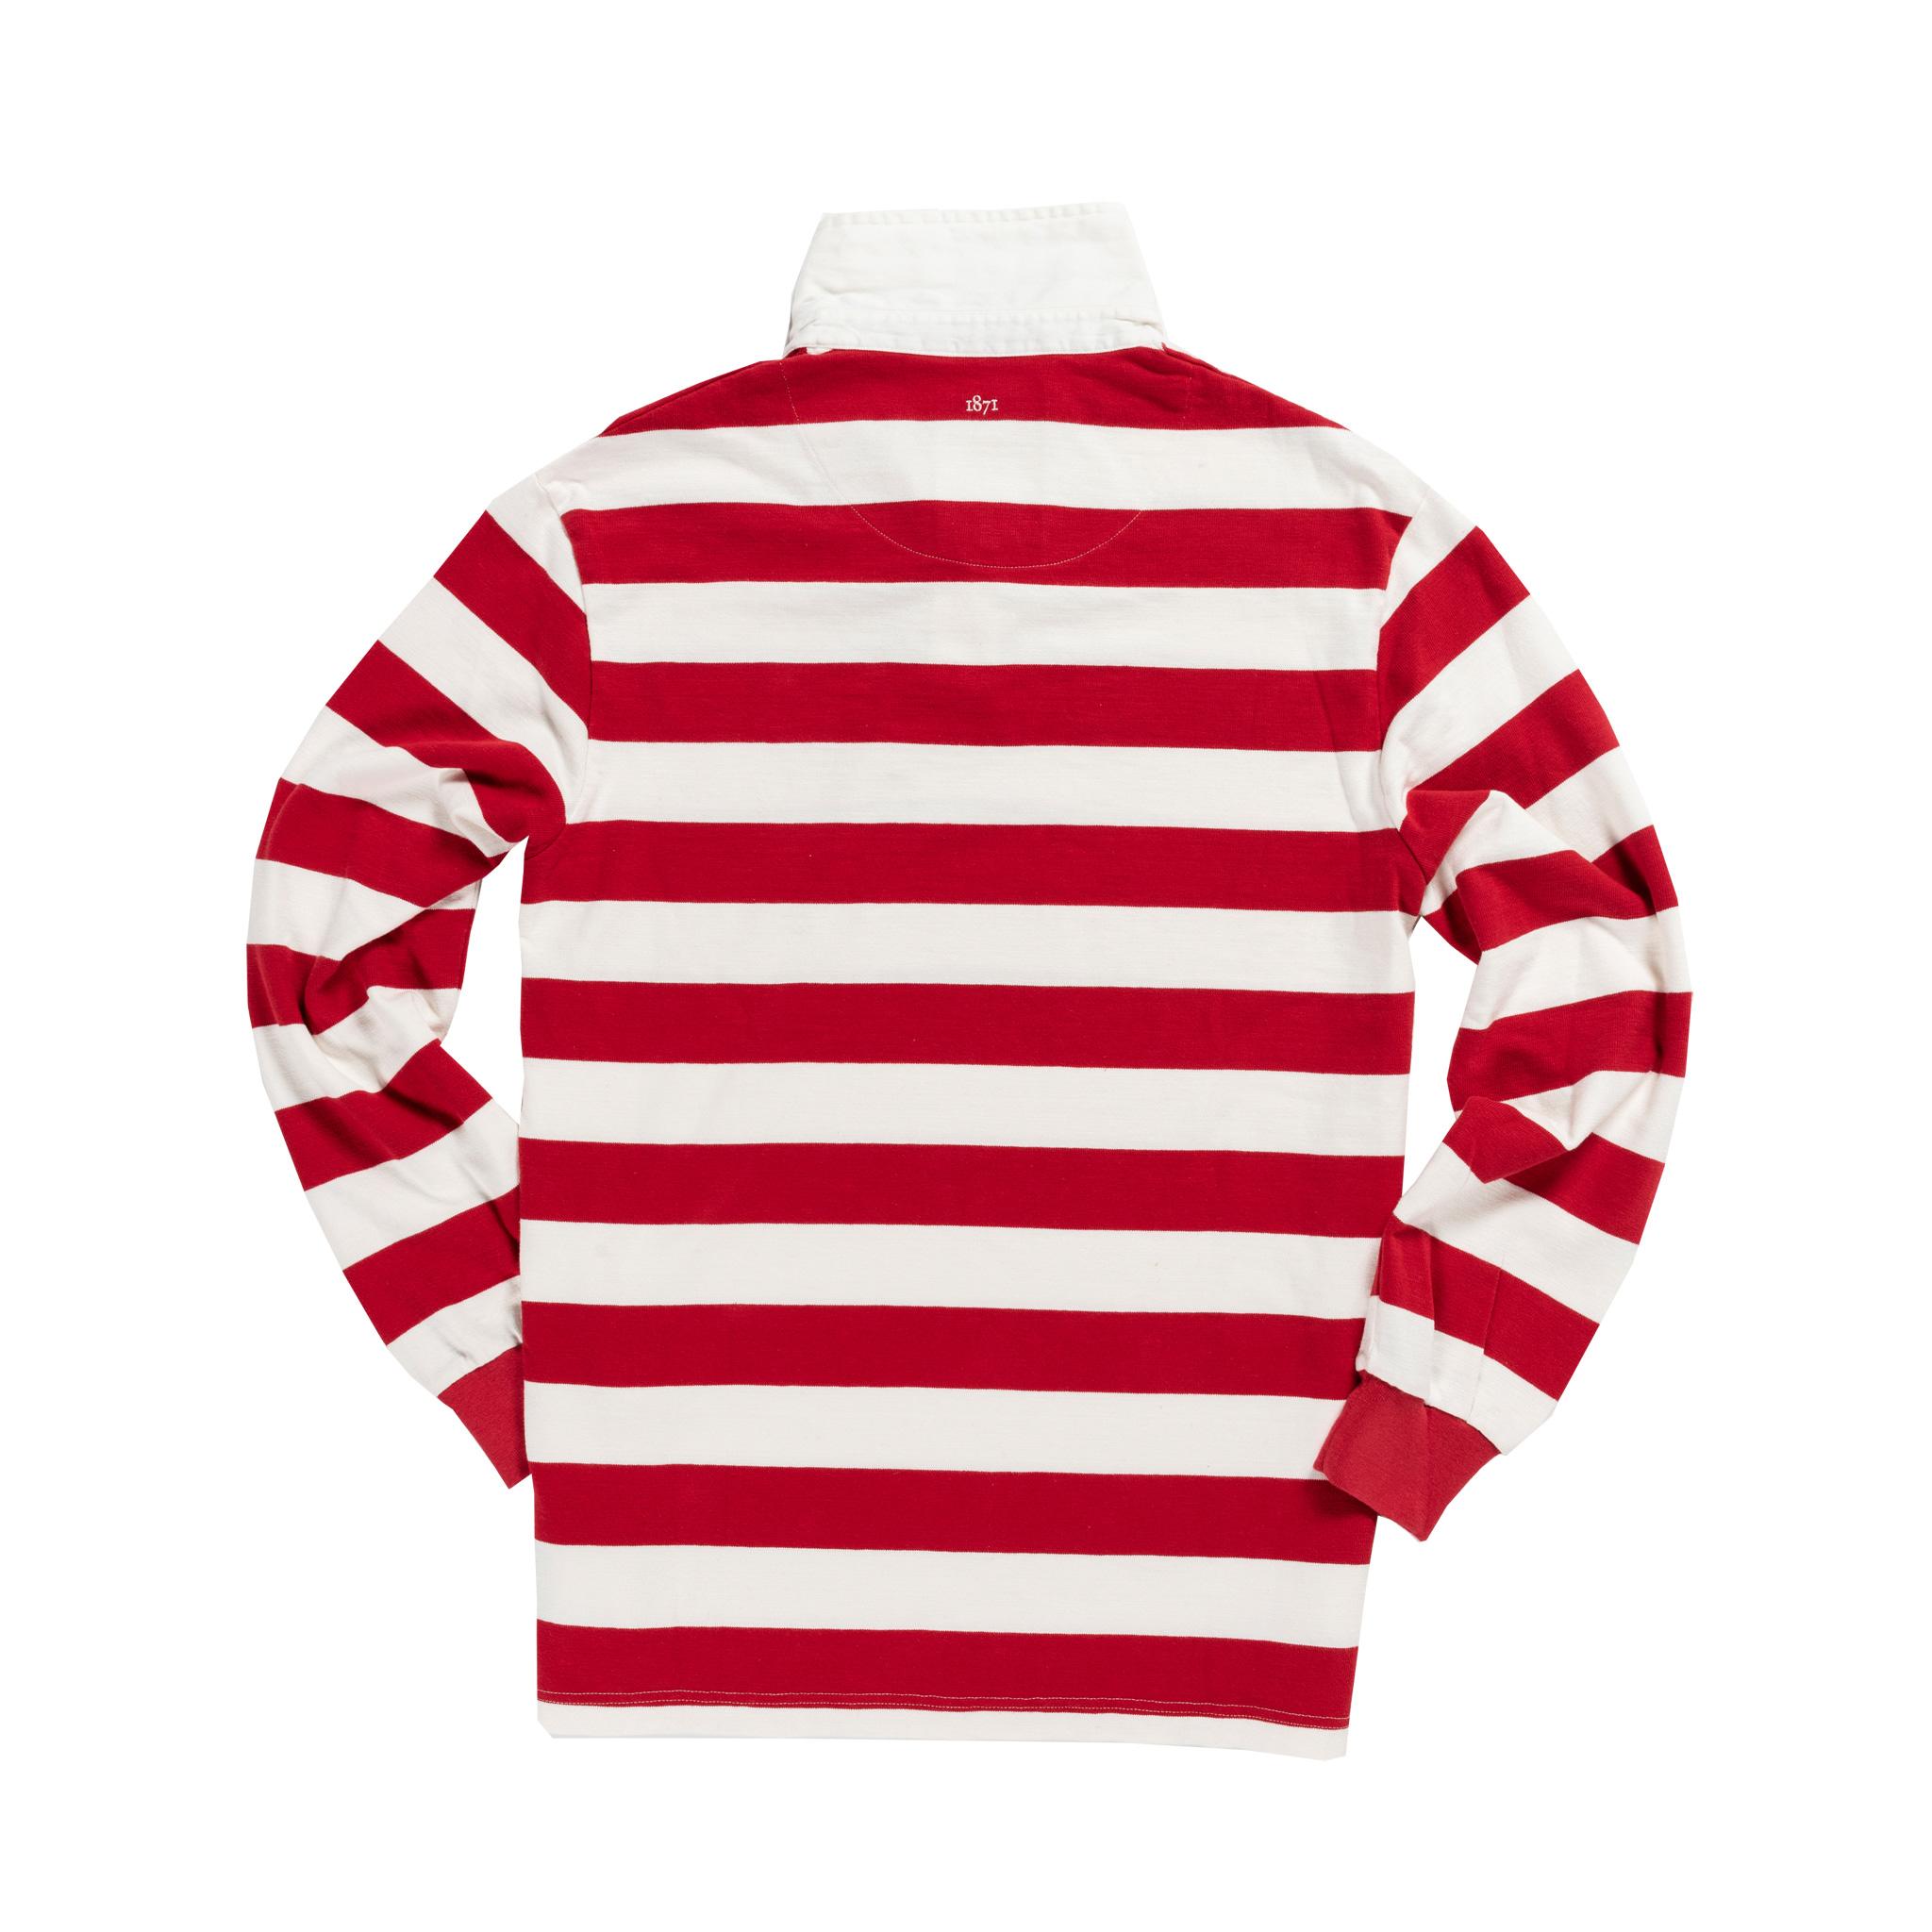 Newcastle Rebels 1908 rugby Shirt_Back